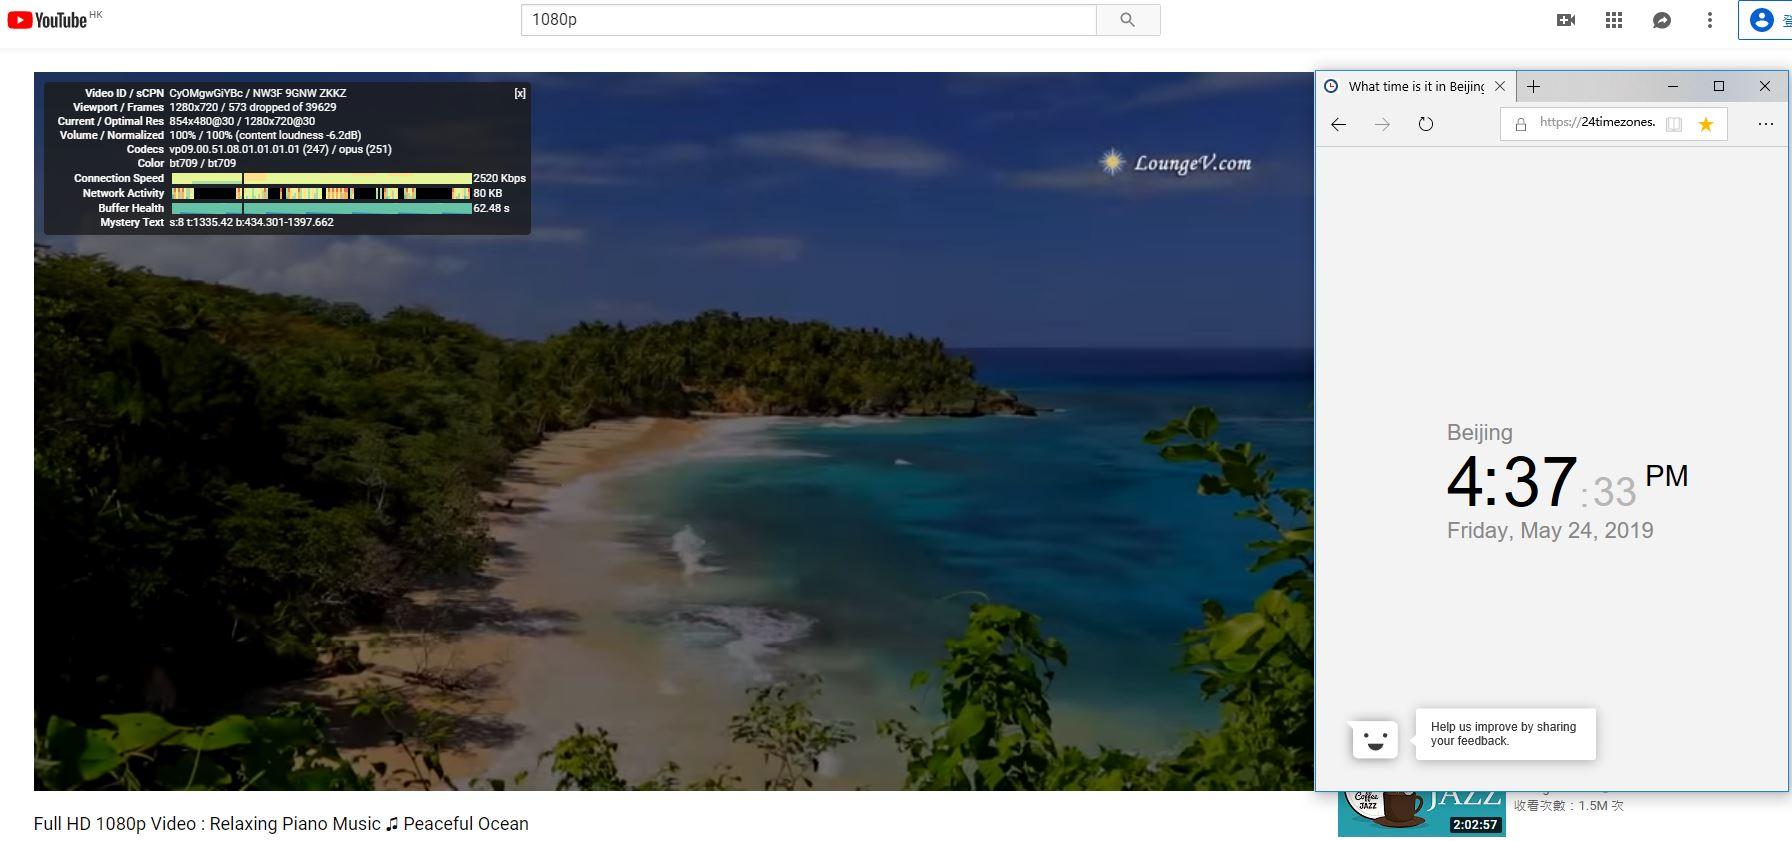 ExpressVPN windows hongkong-5节点 翻墙成功-youtube-20190524